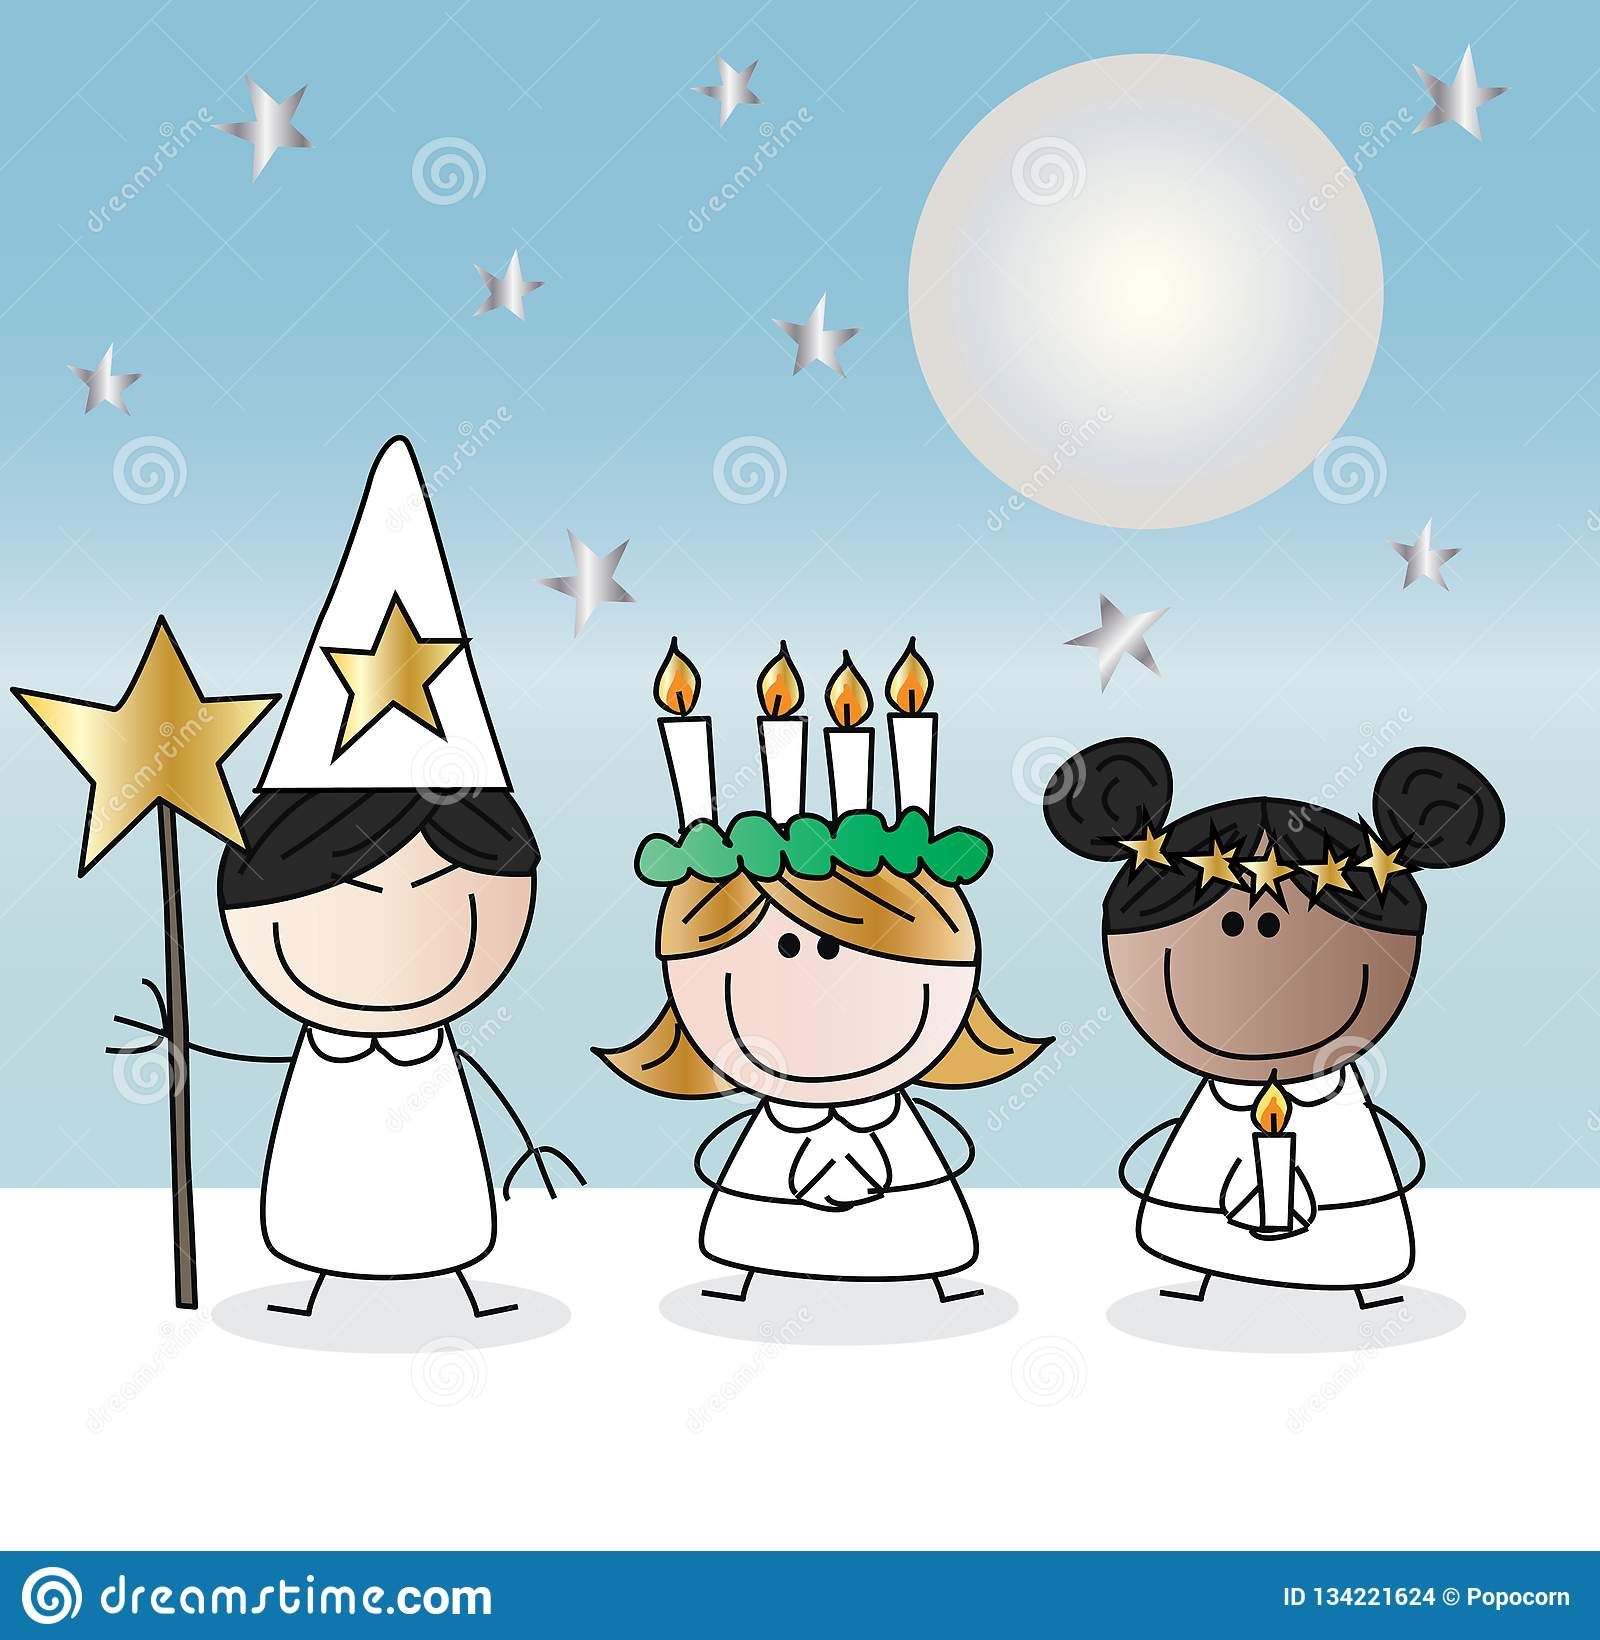 Saint lucy ou Natal de Lucia do sankta